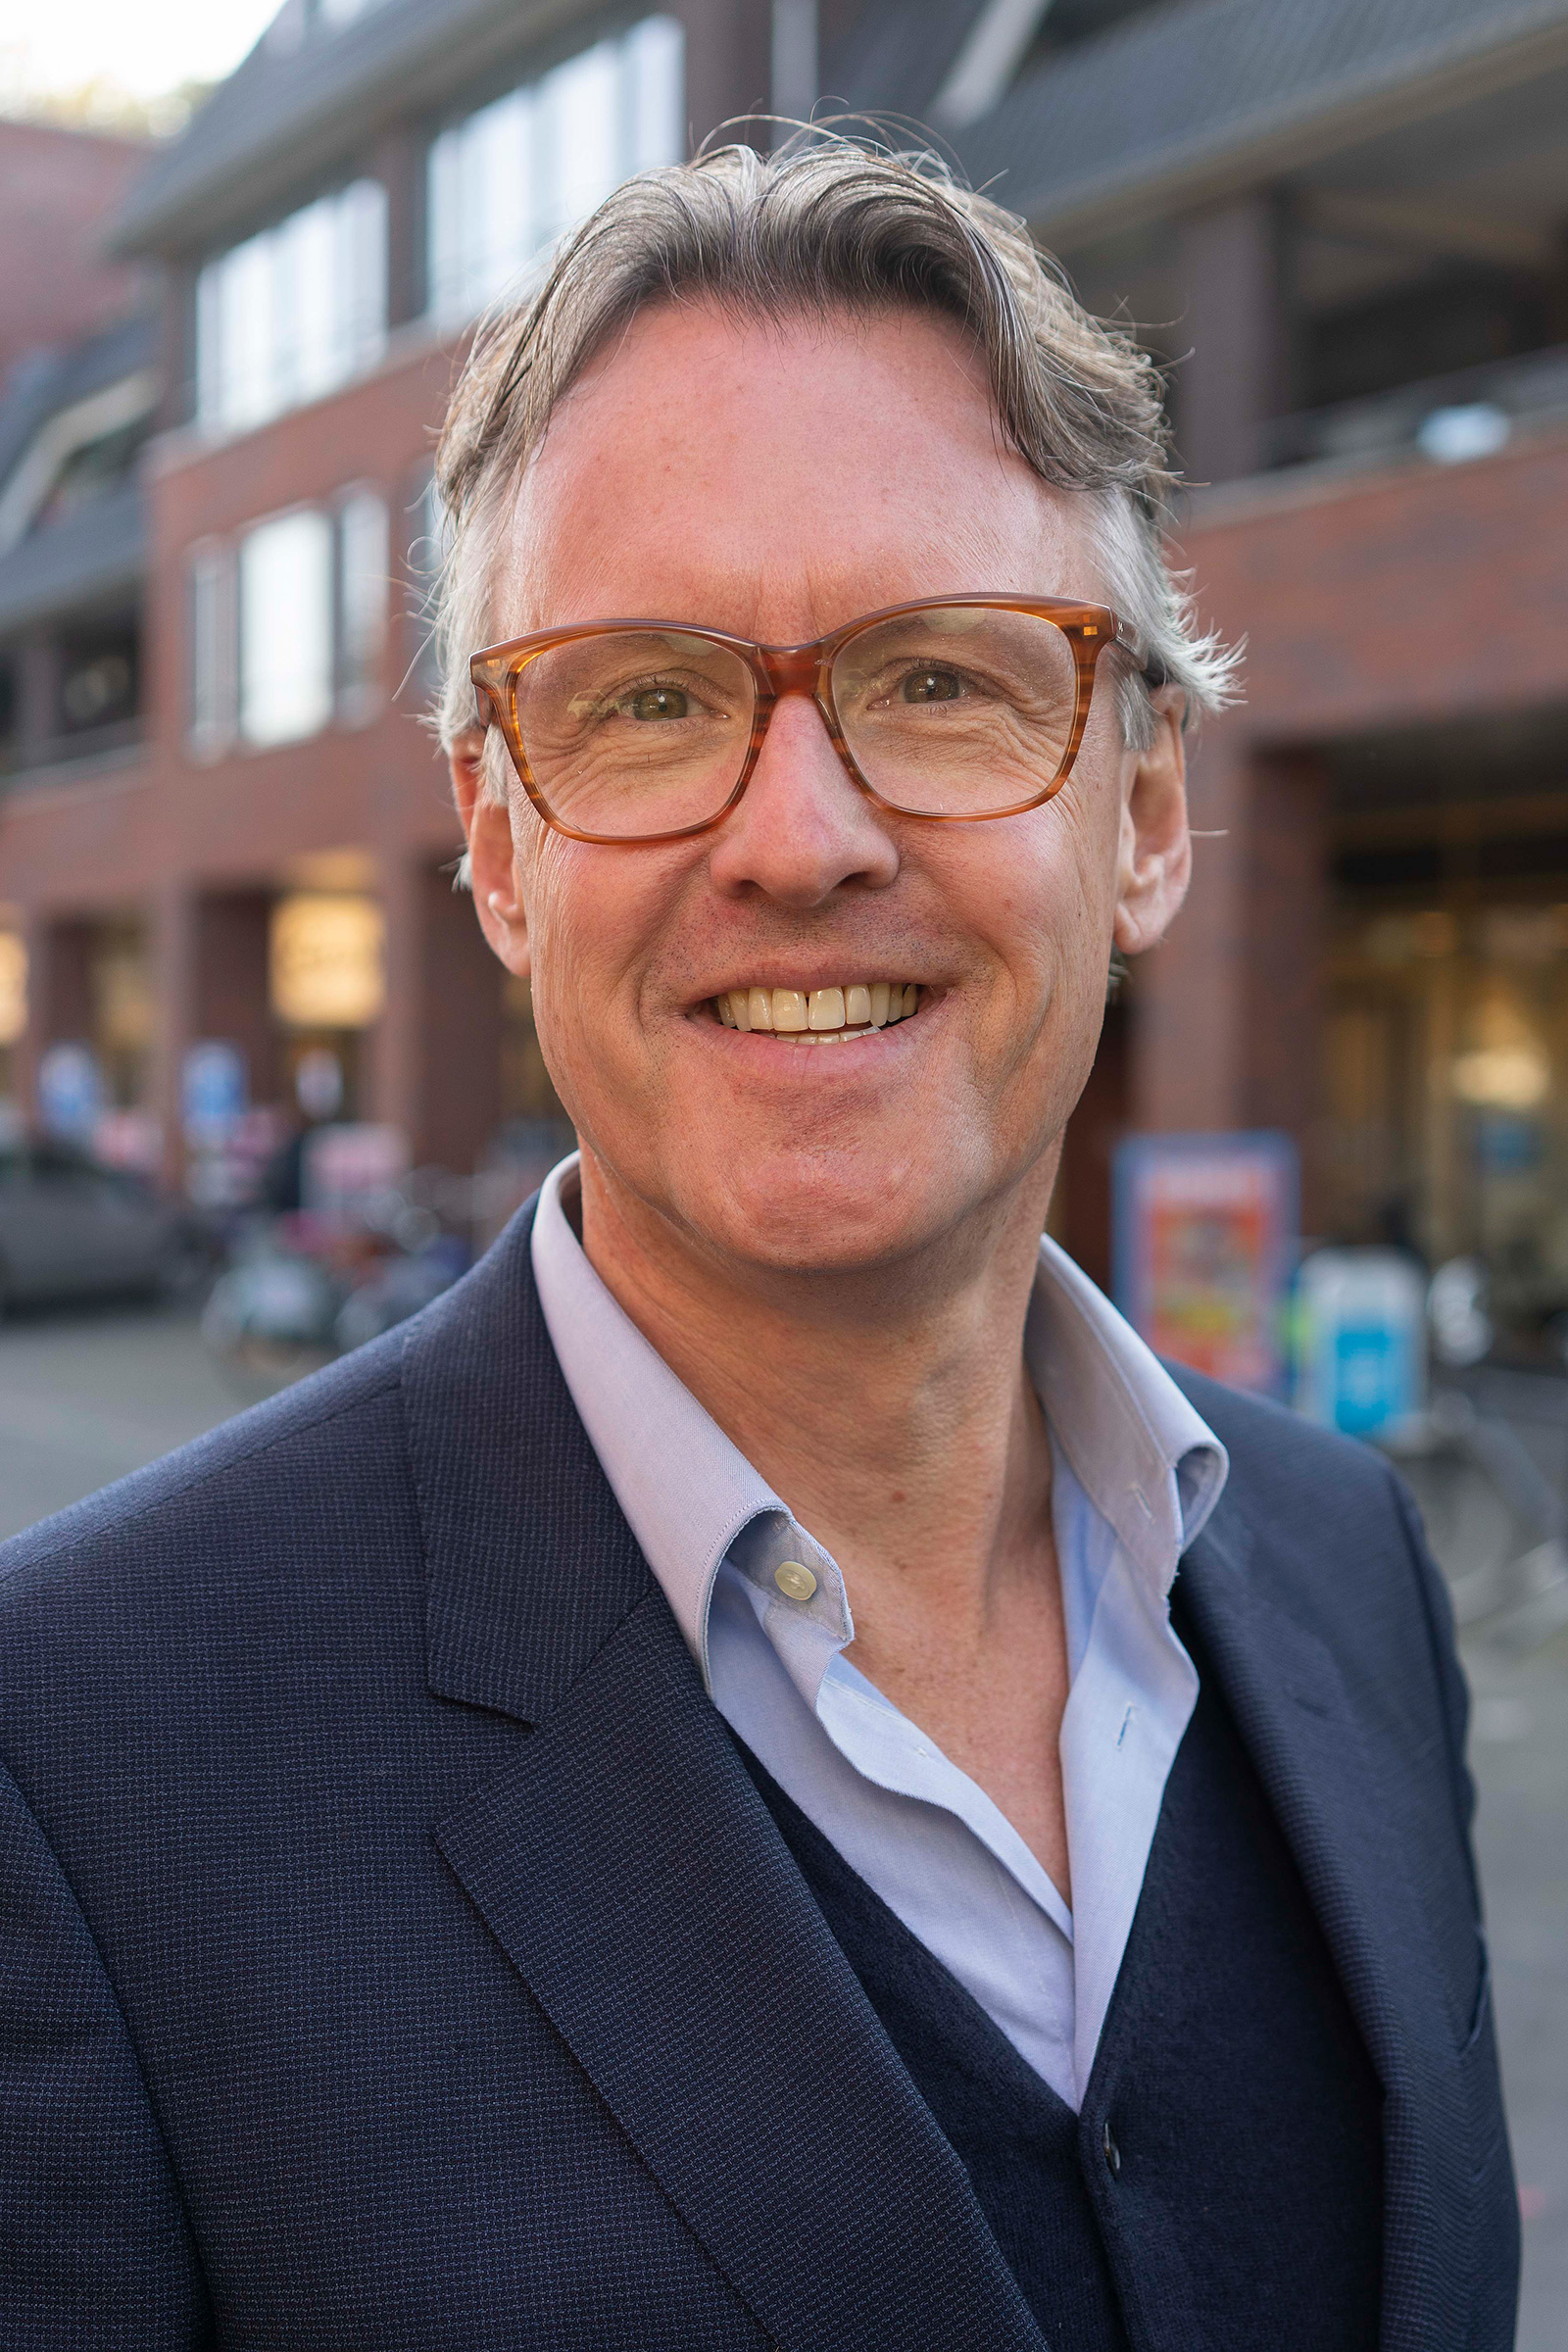 Frank Van Gorkom